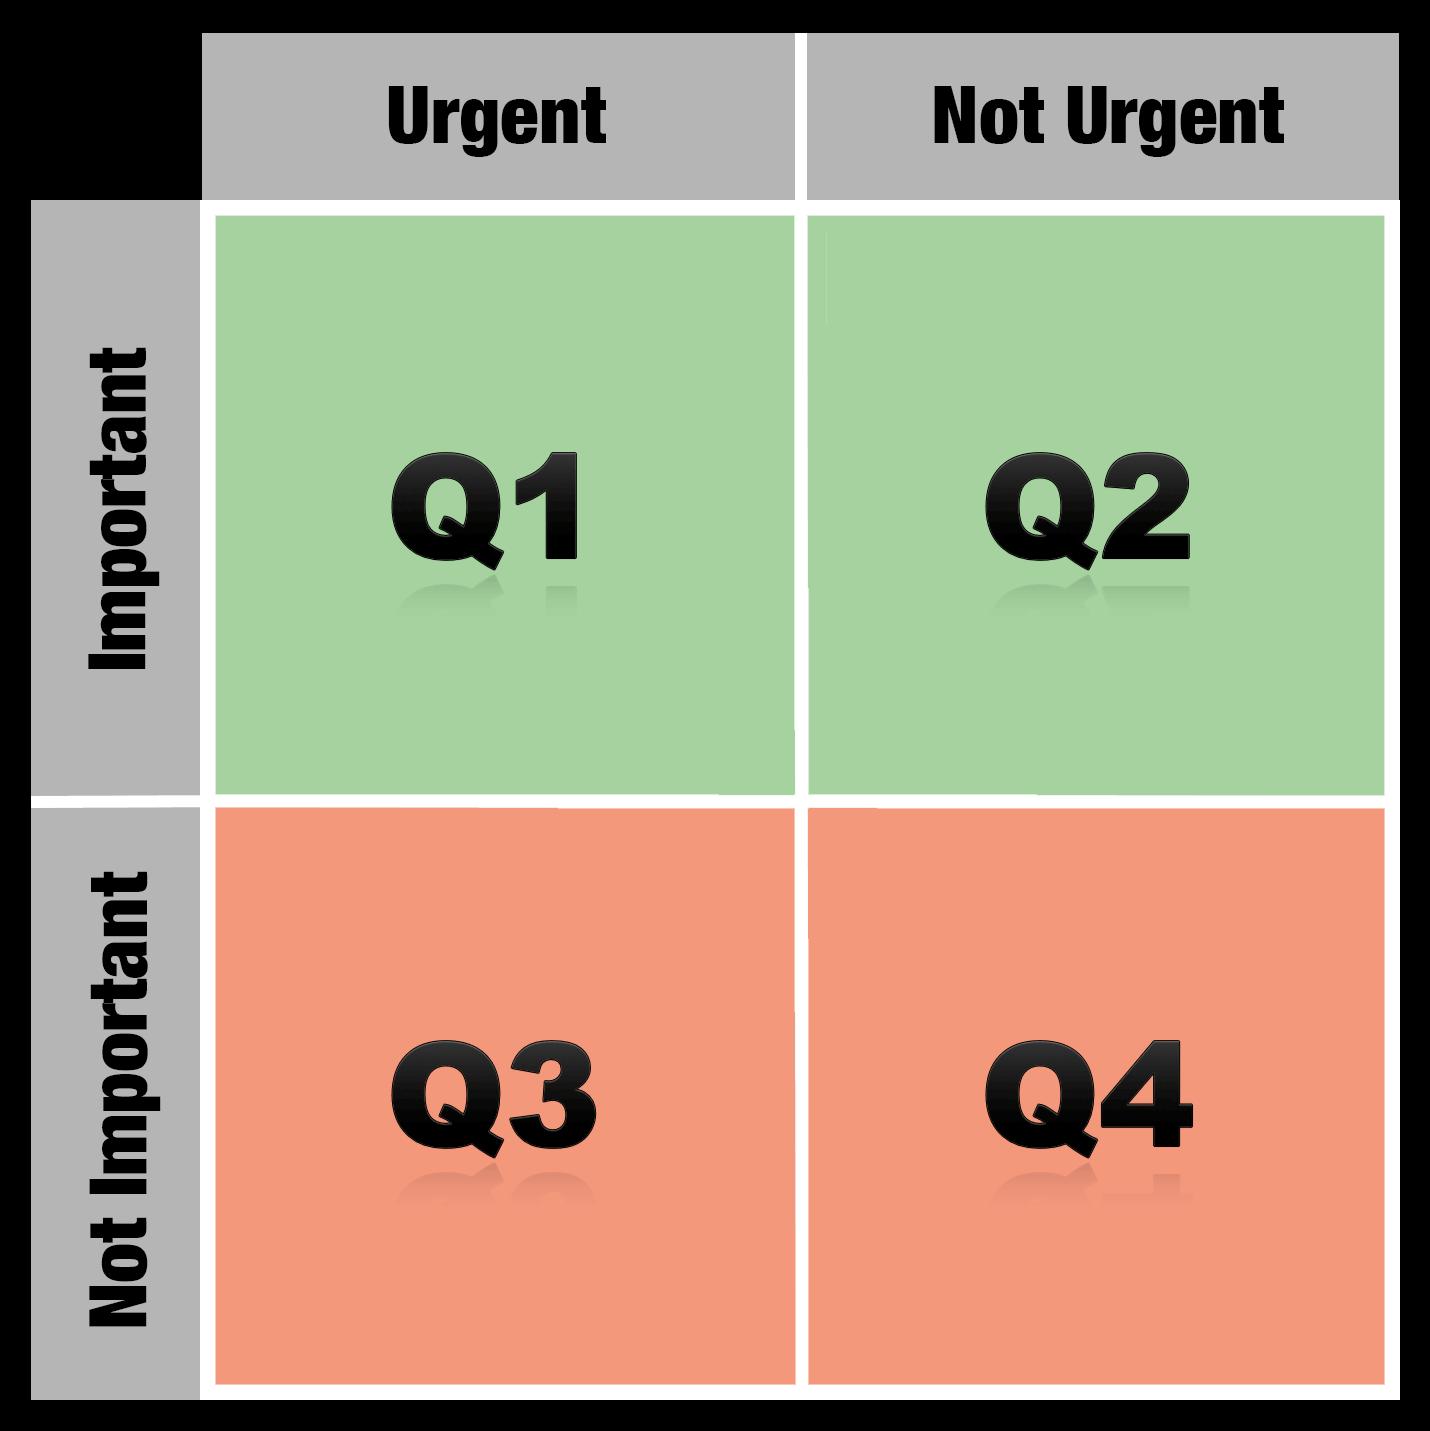 Eisenhower Matrix - Urgent vs important